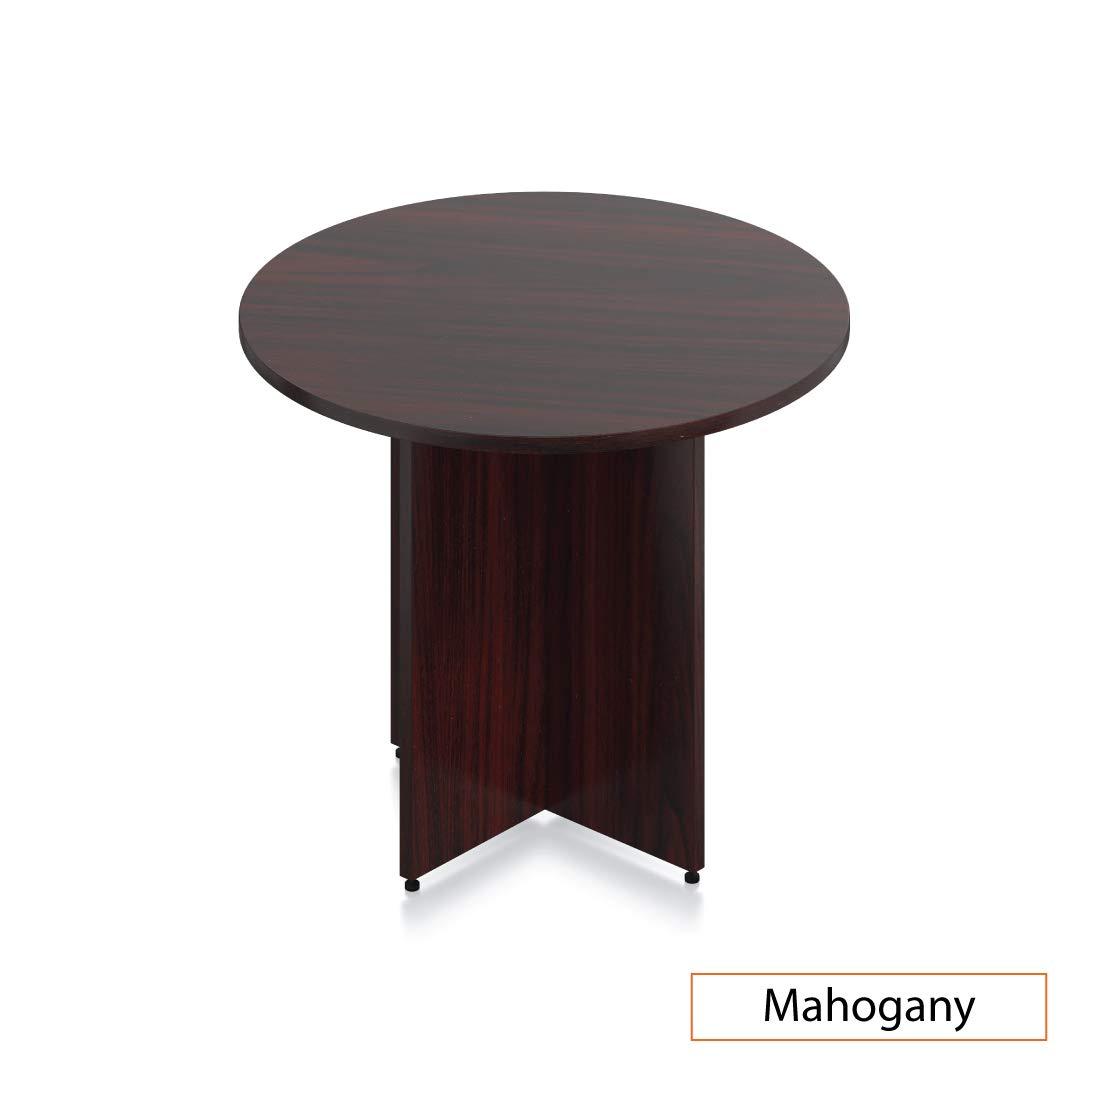 GOF 36'' Round Table (36W x 36D x 29.5H), Cherry, Espresso, Mahogany, Walnut (Mahogany) by GOF (Image #1)